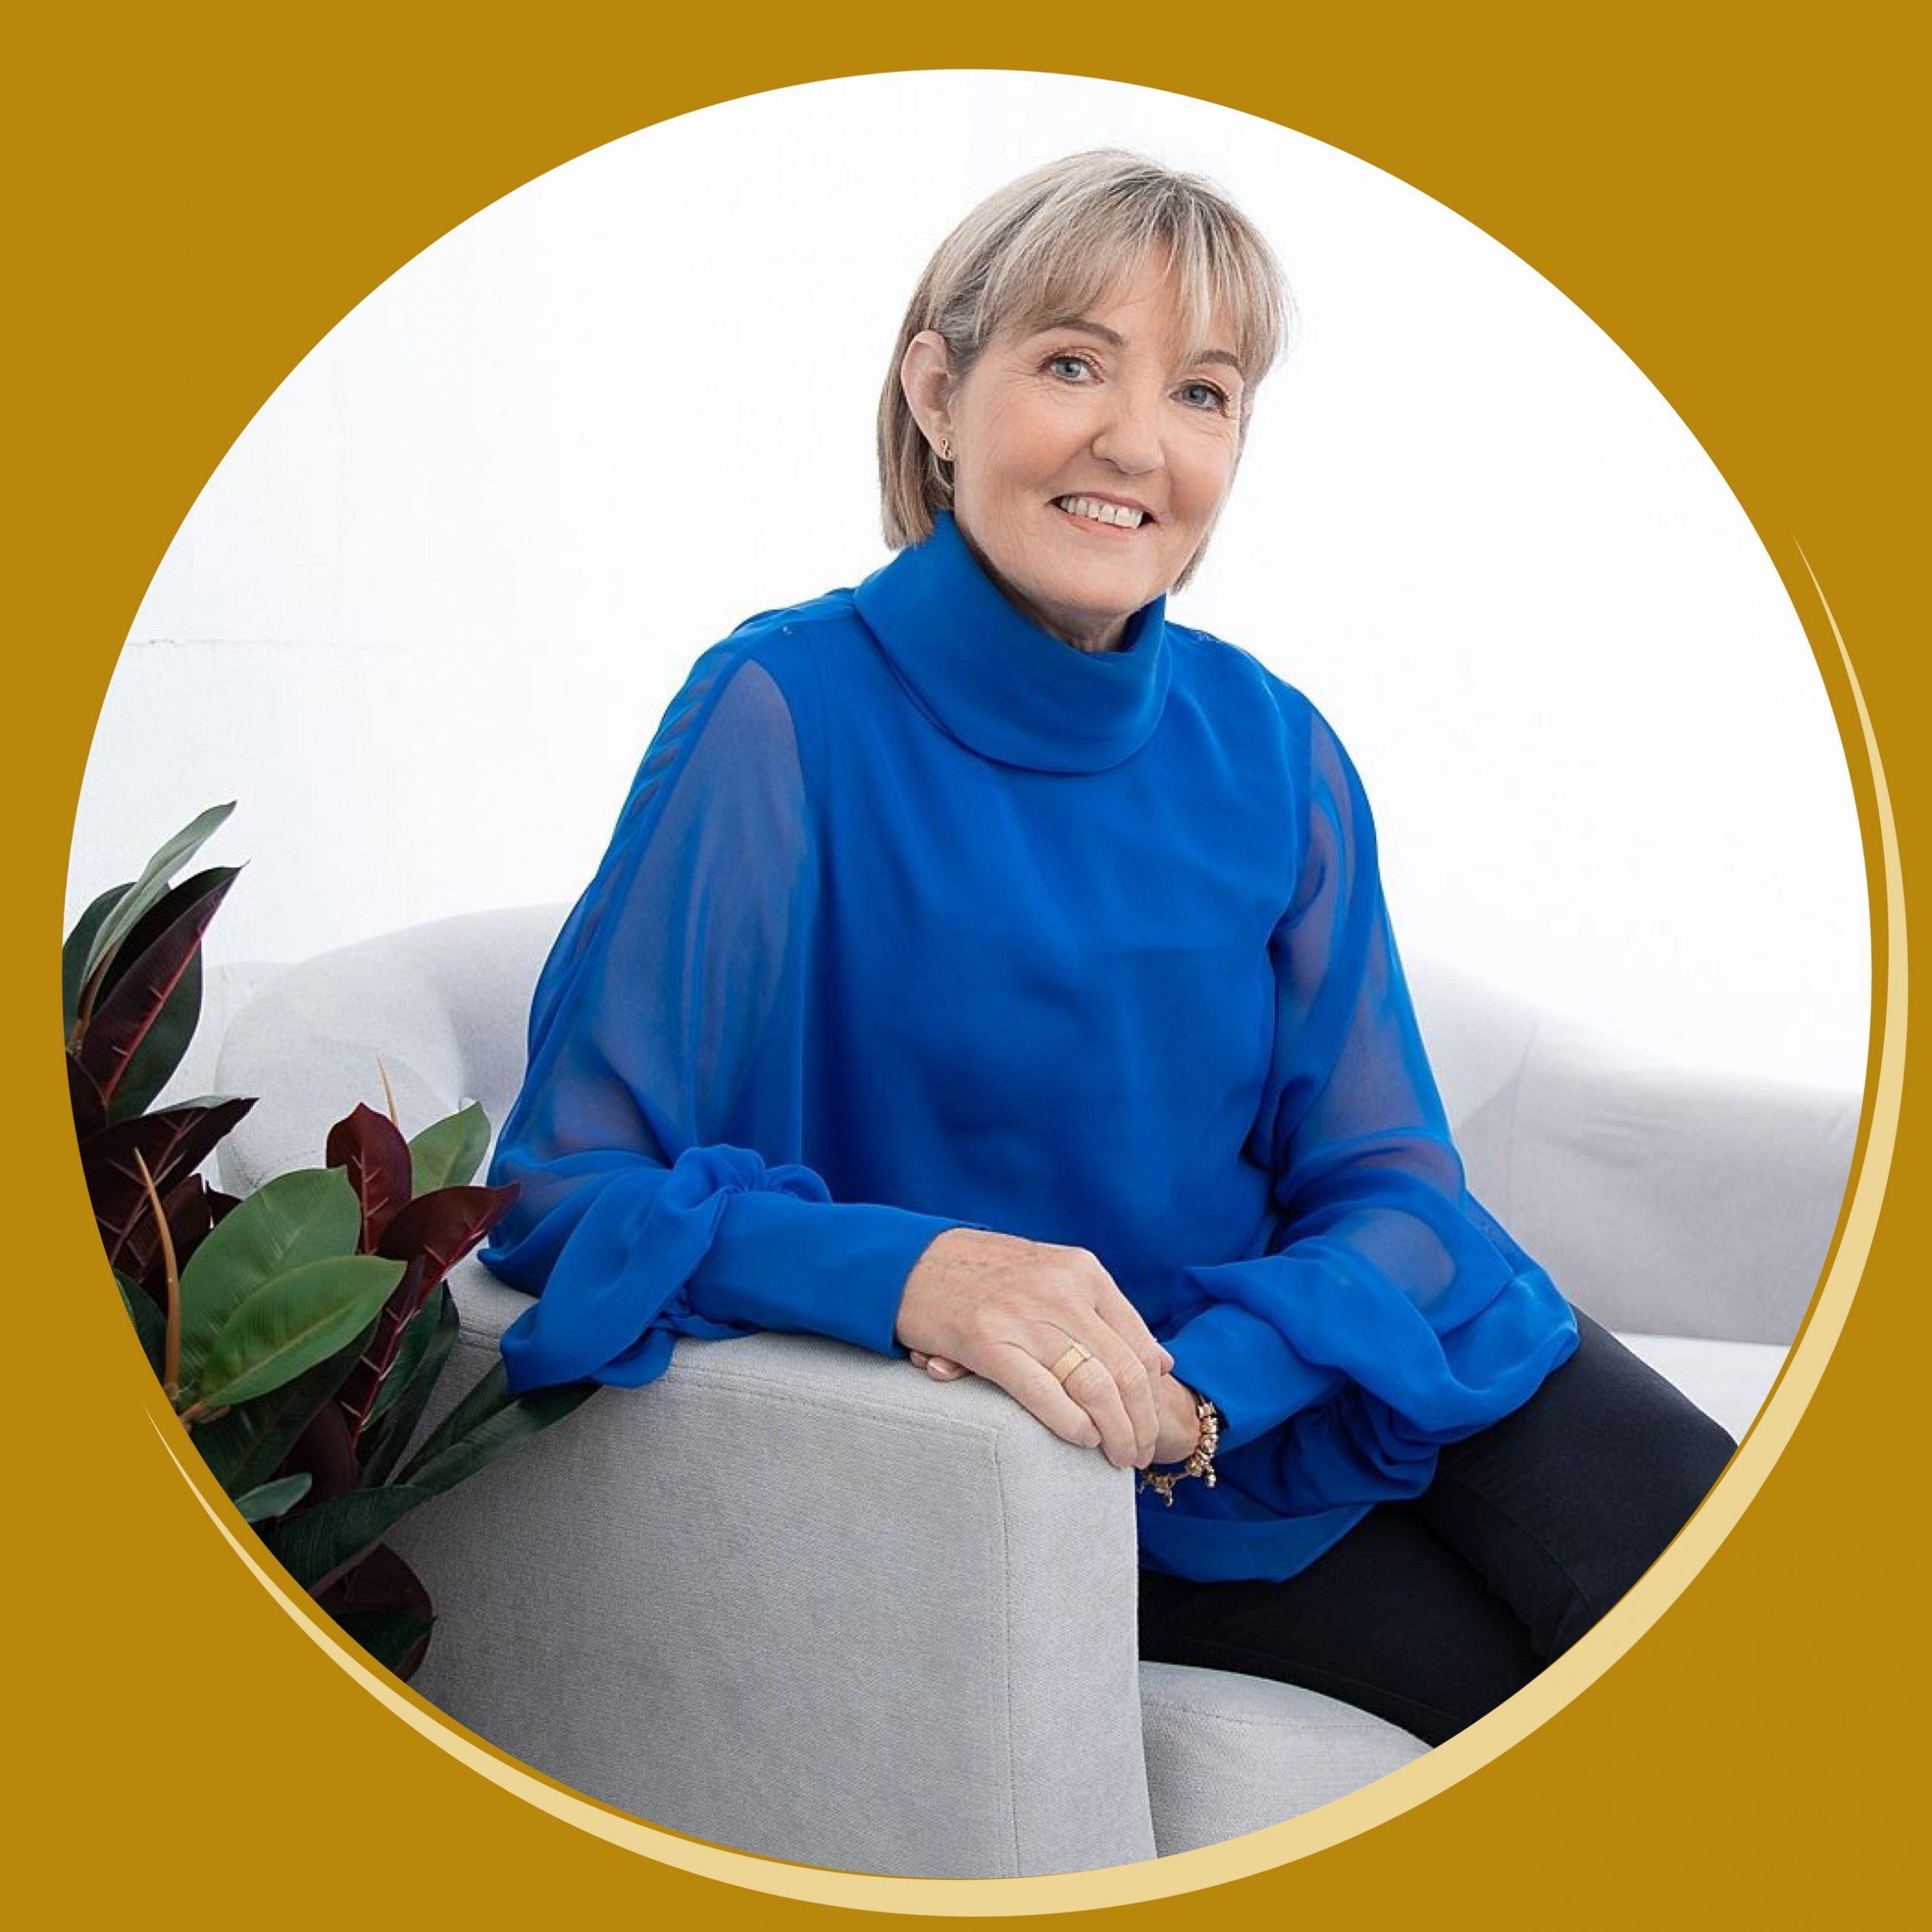 Joan Profile Image